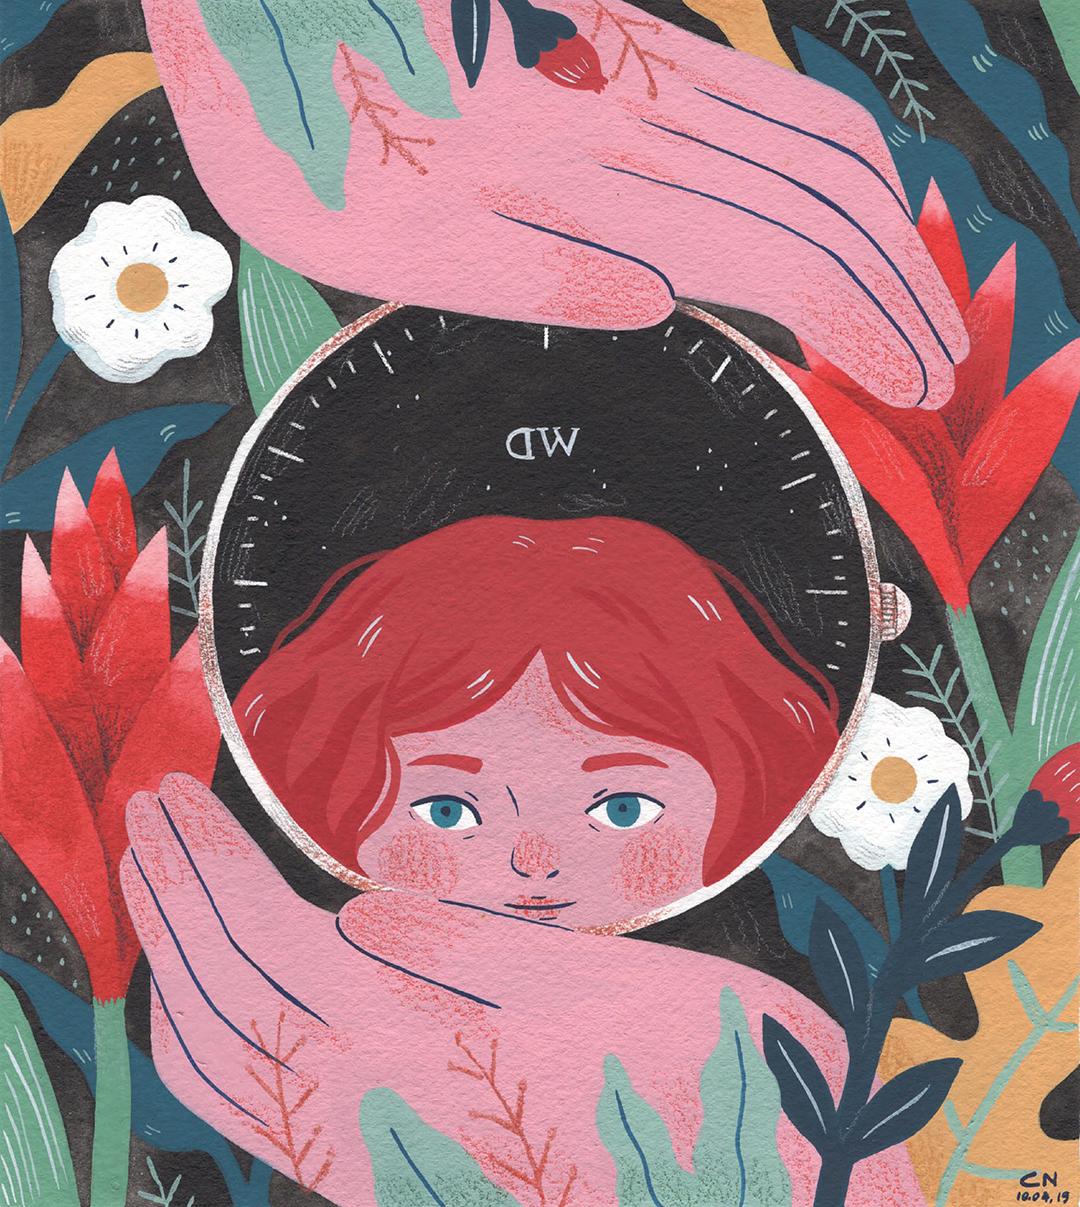 GirlsclubAsia-Illustrator-Chubbynida-artwork-05.jpg